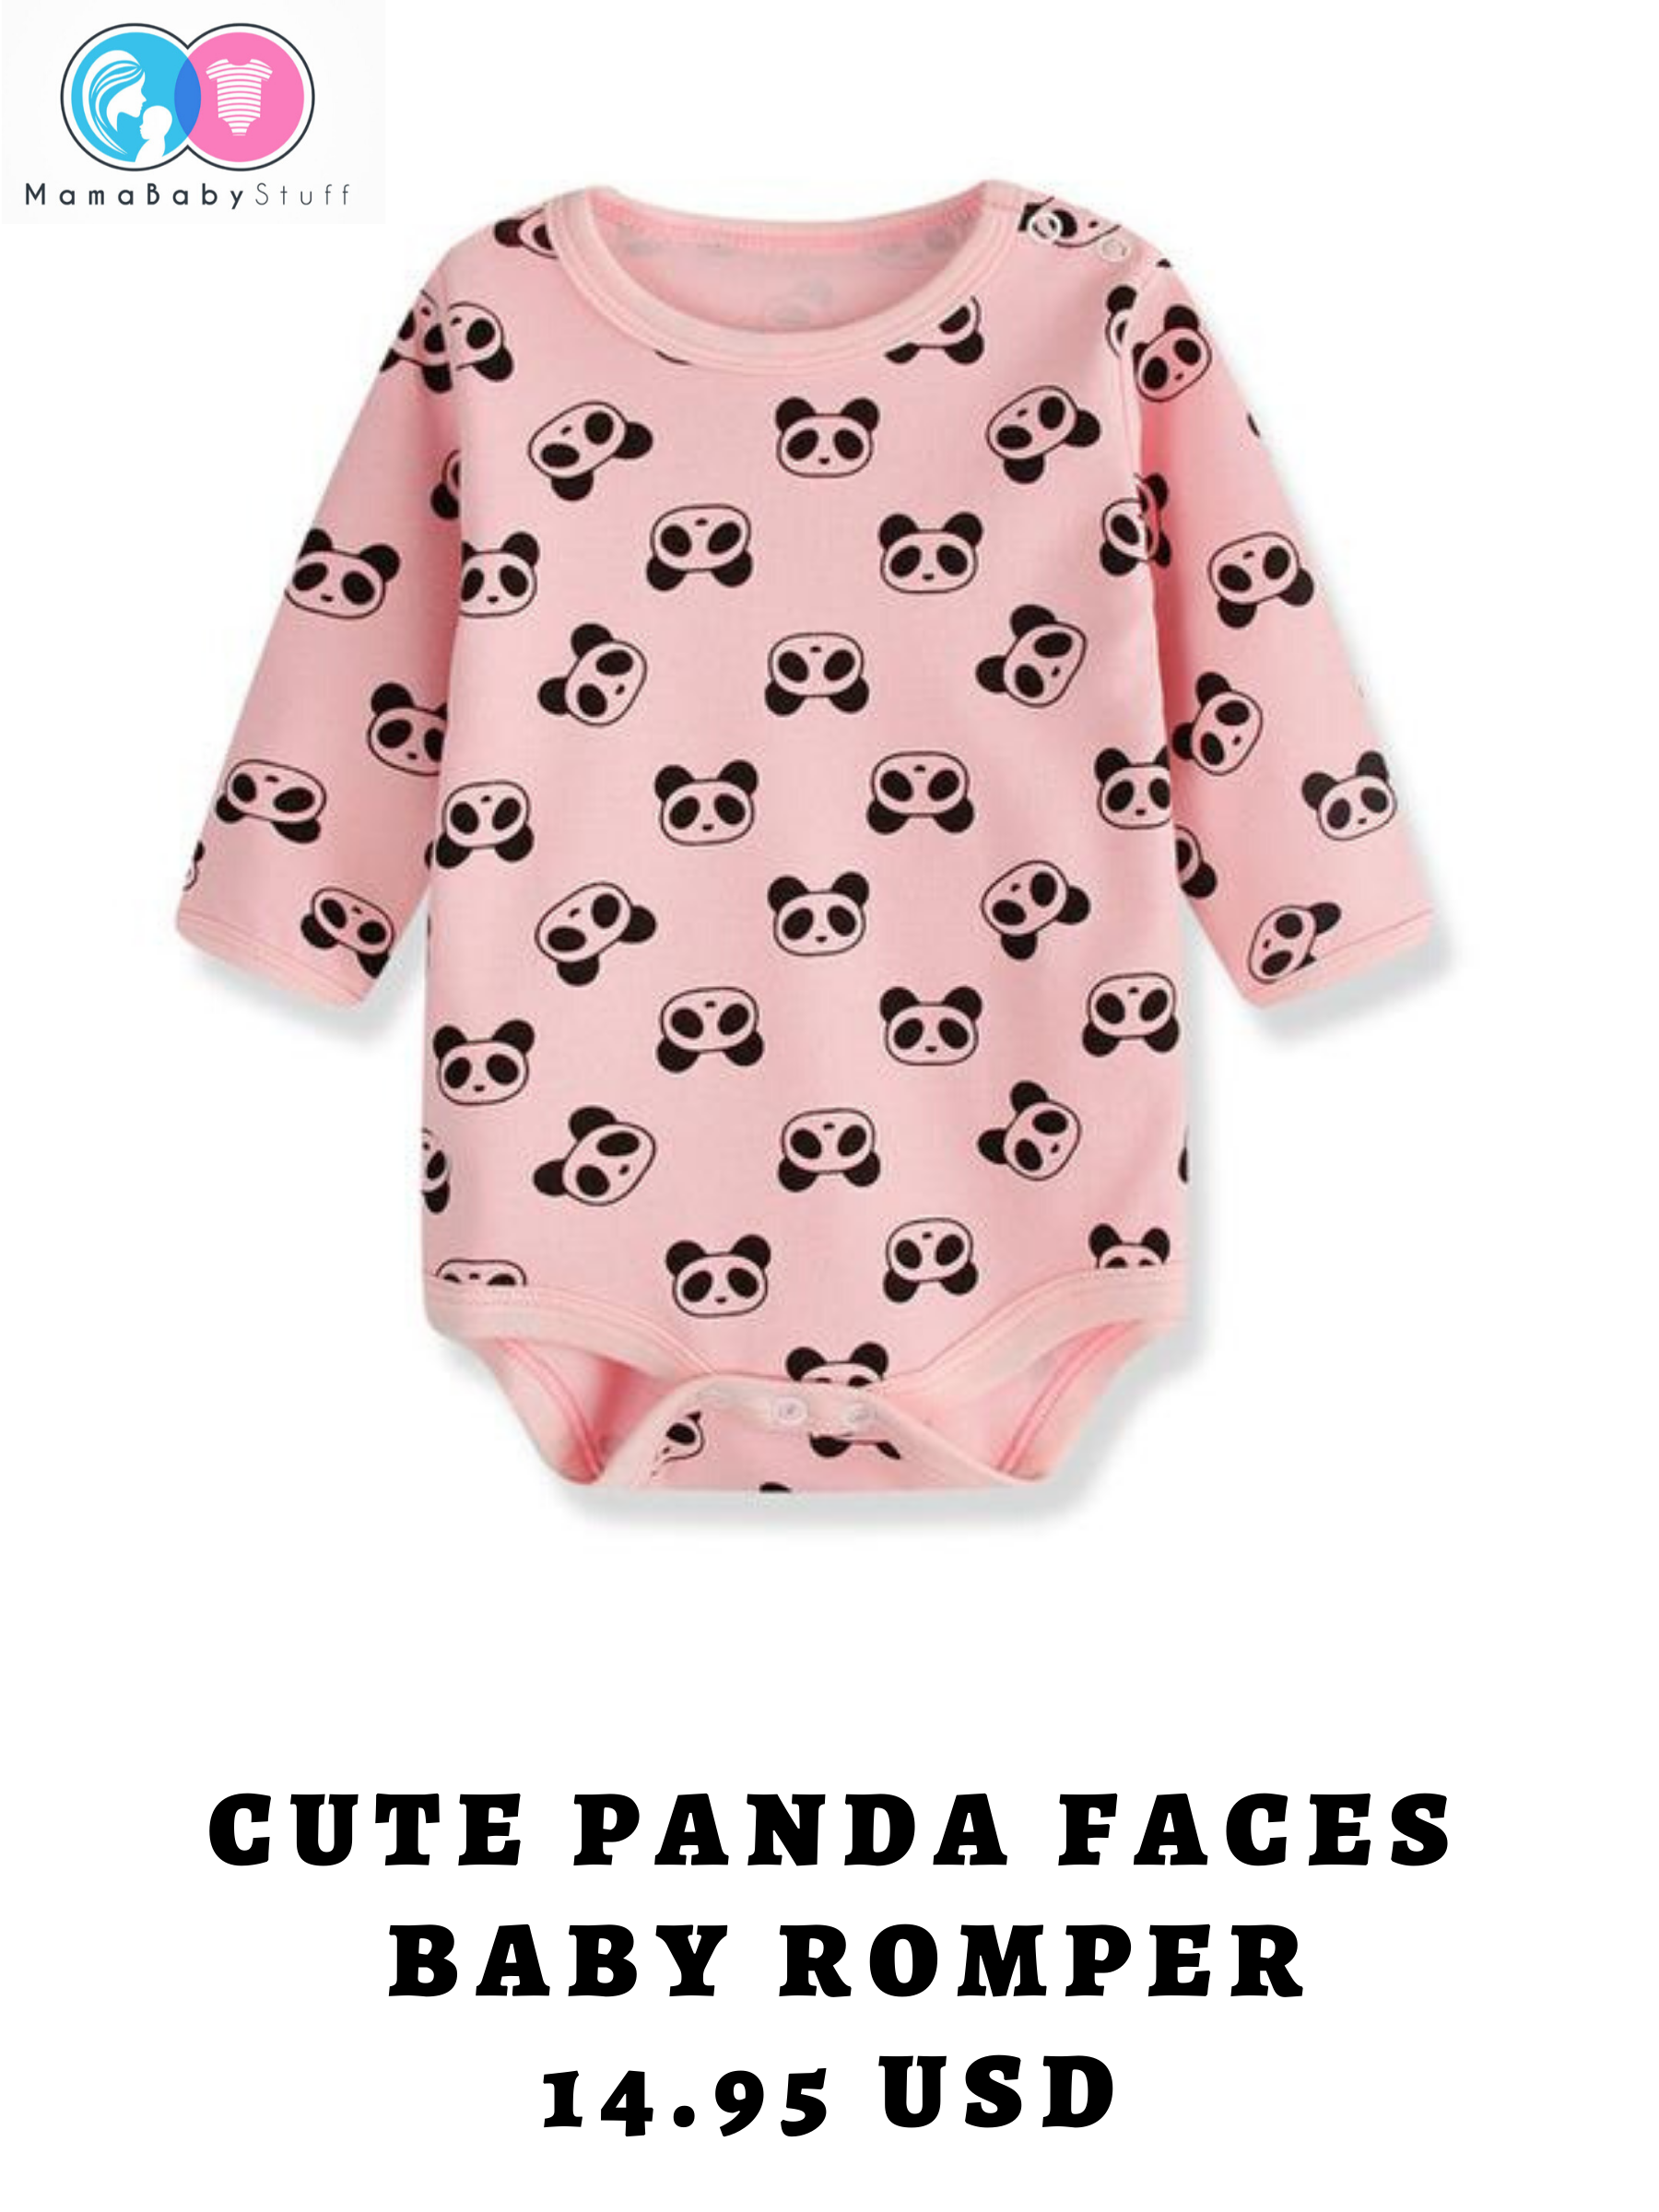 Cute Panda Faces baby Romper  Baby fashion newborn, Baby fashion